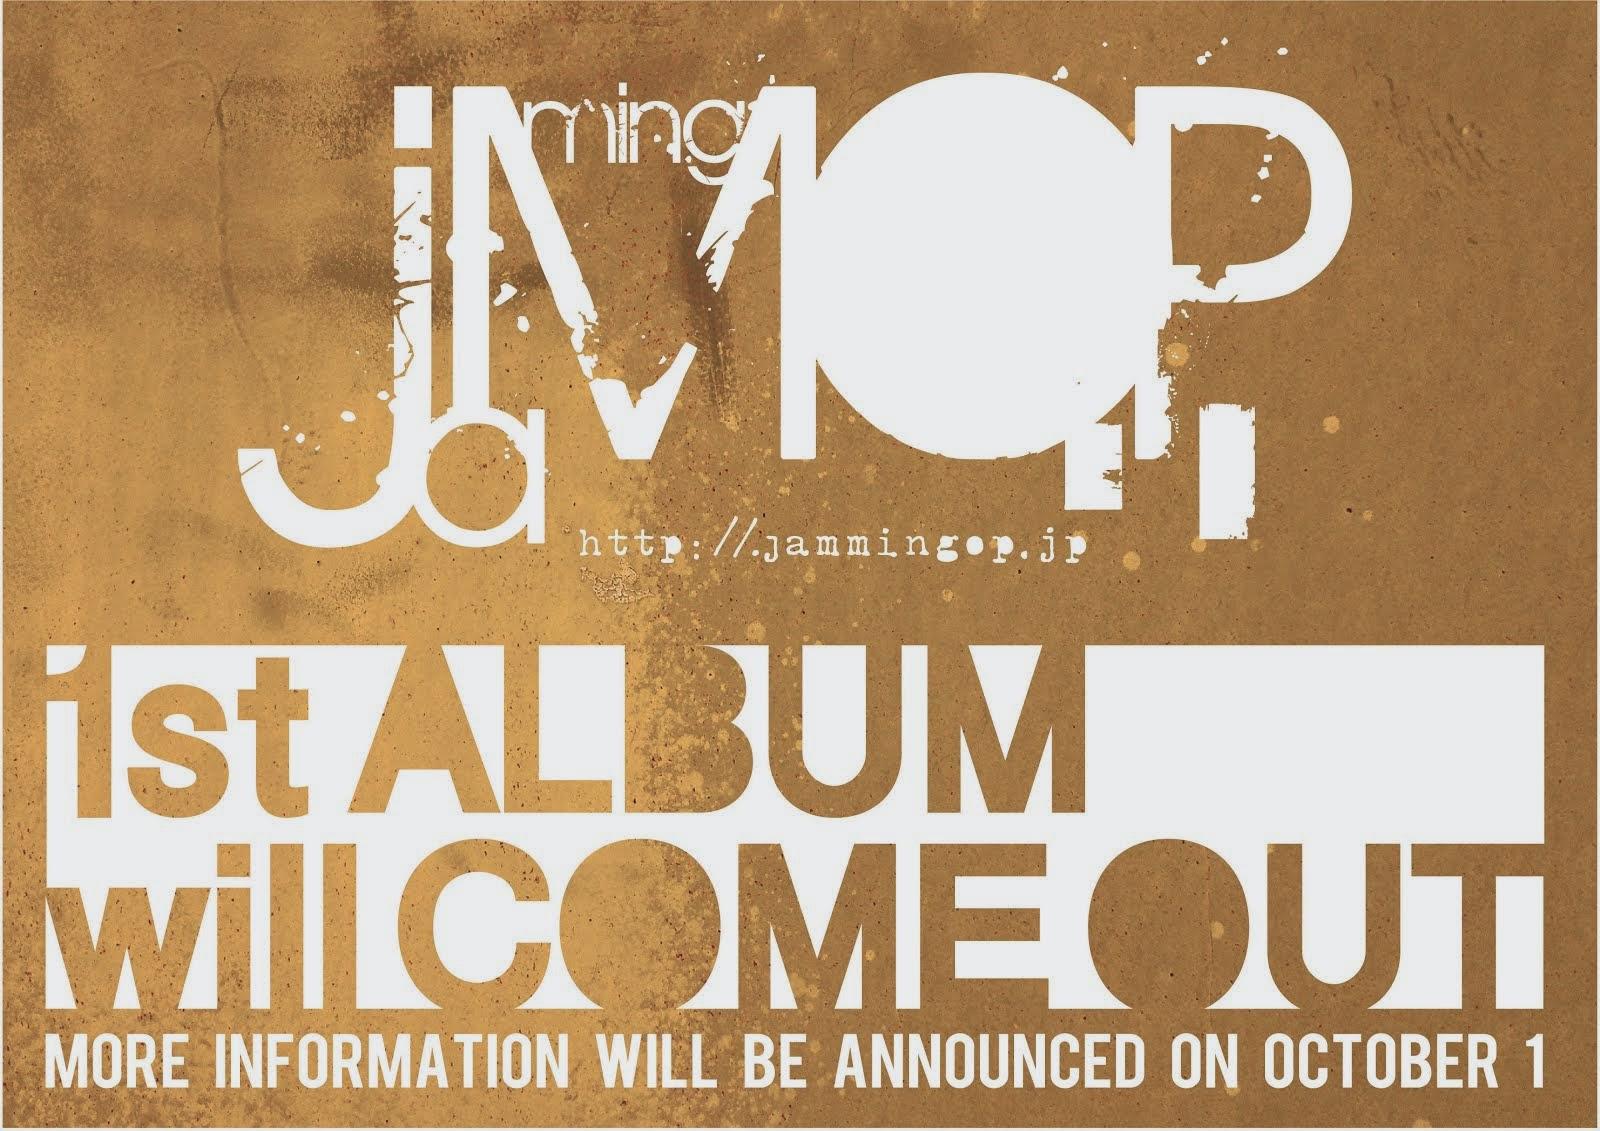 jamming O.P.